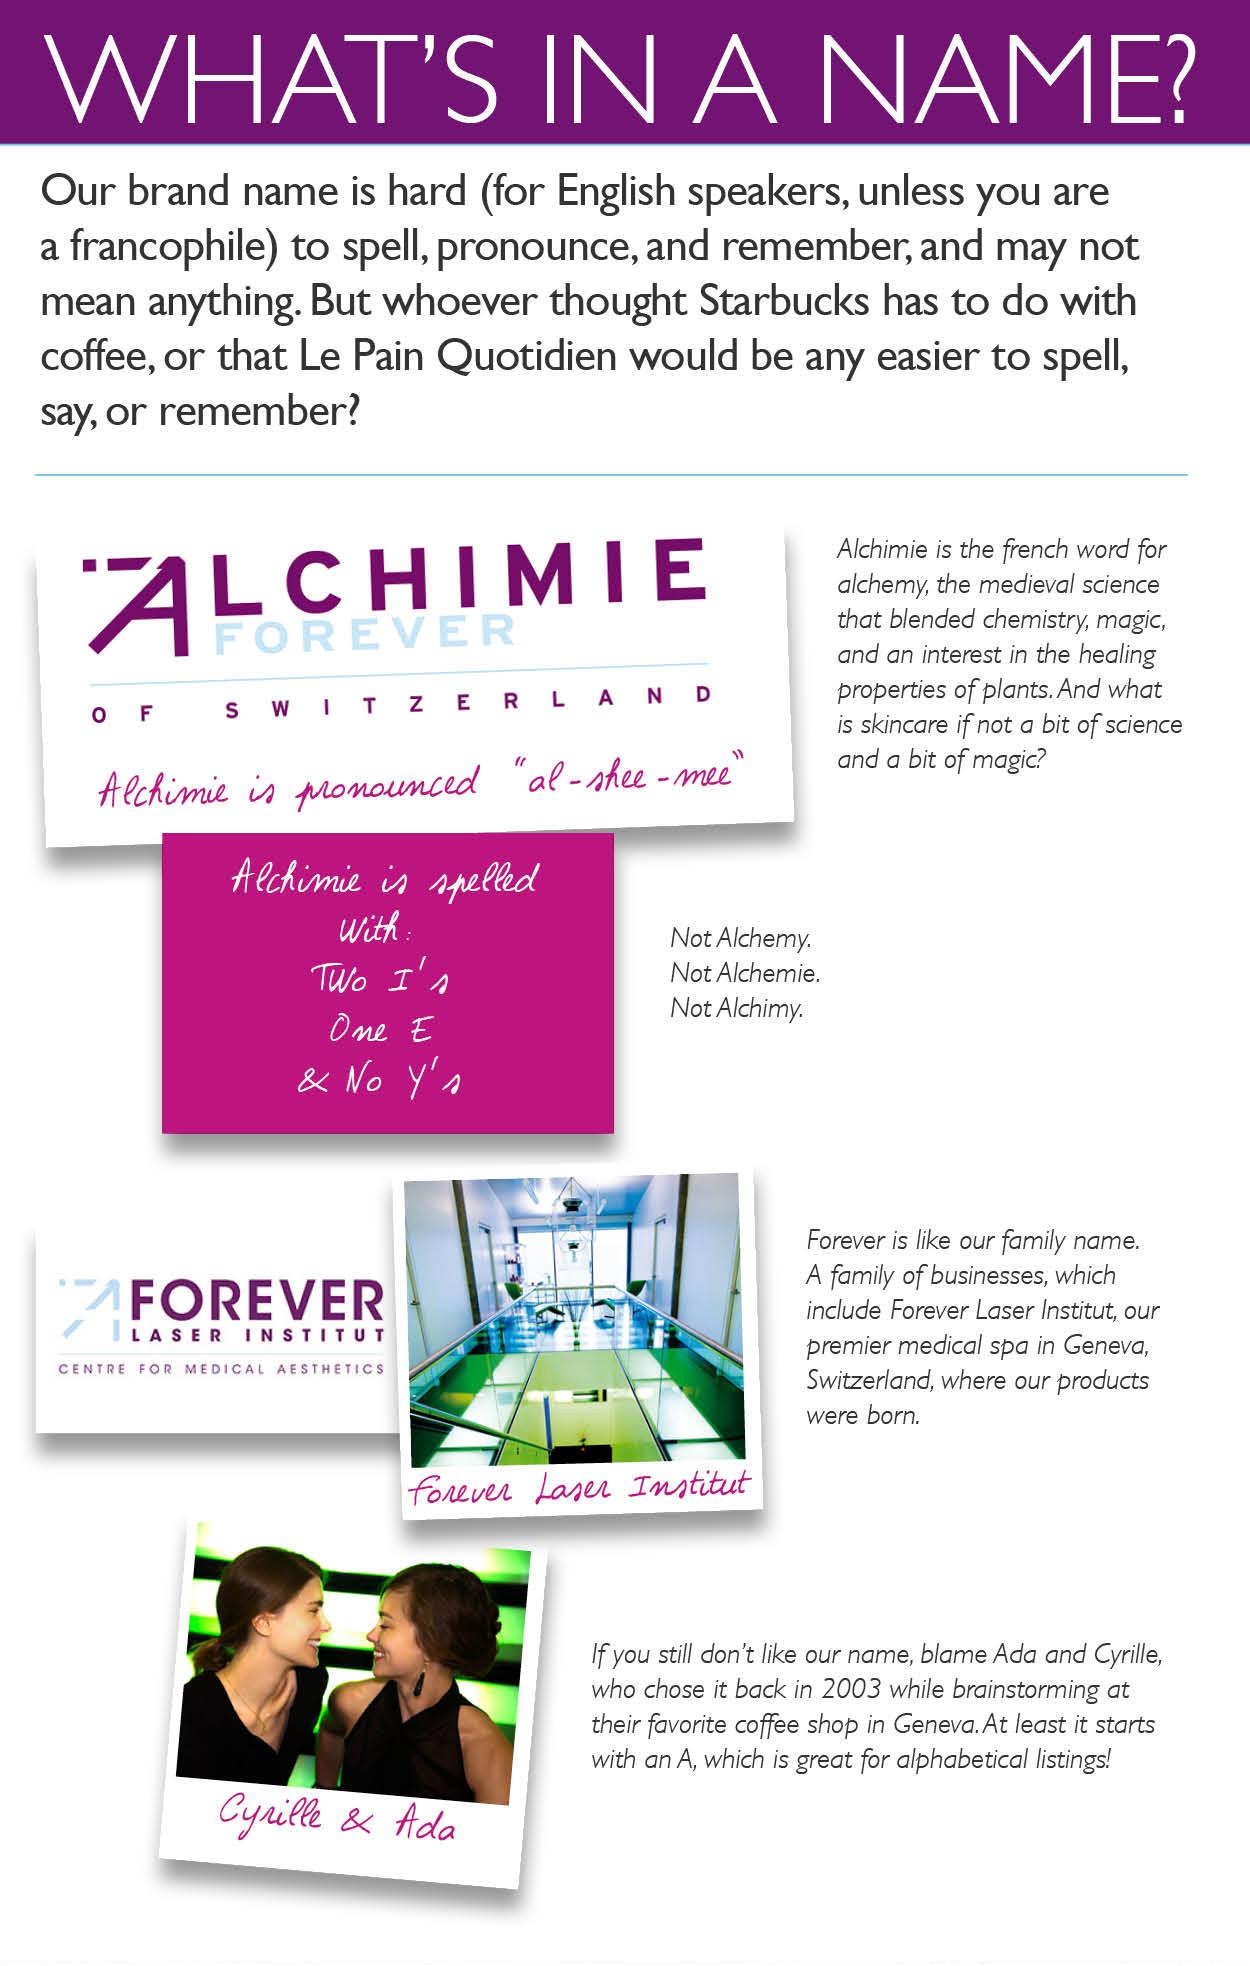 Alchimie name